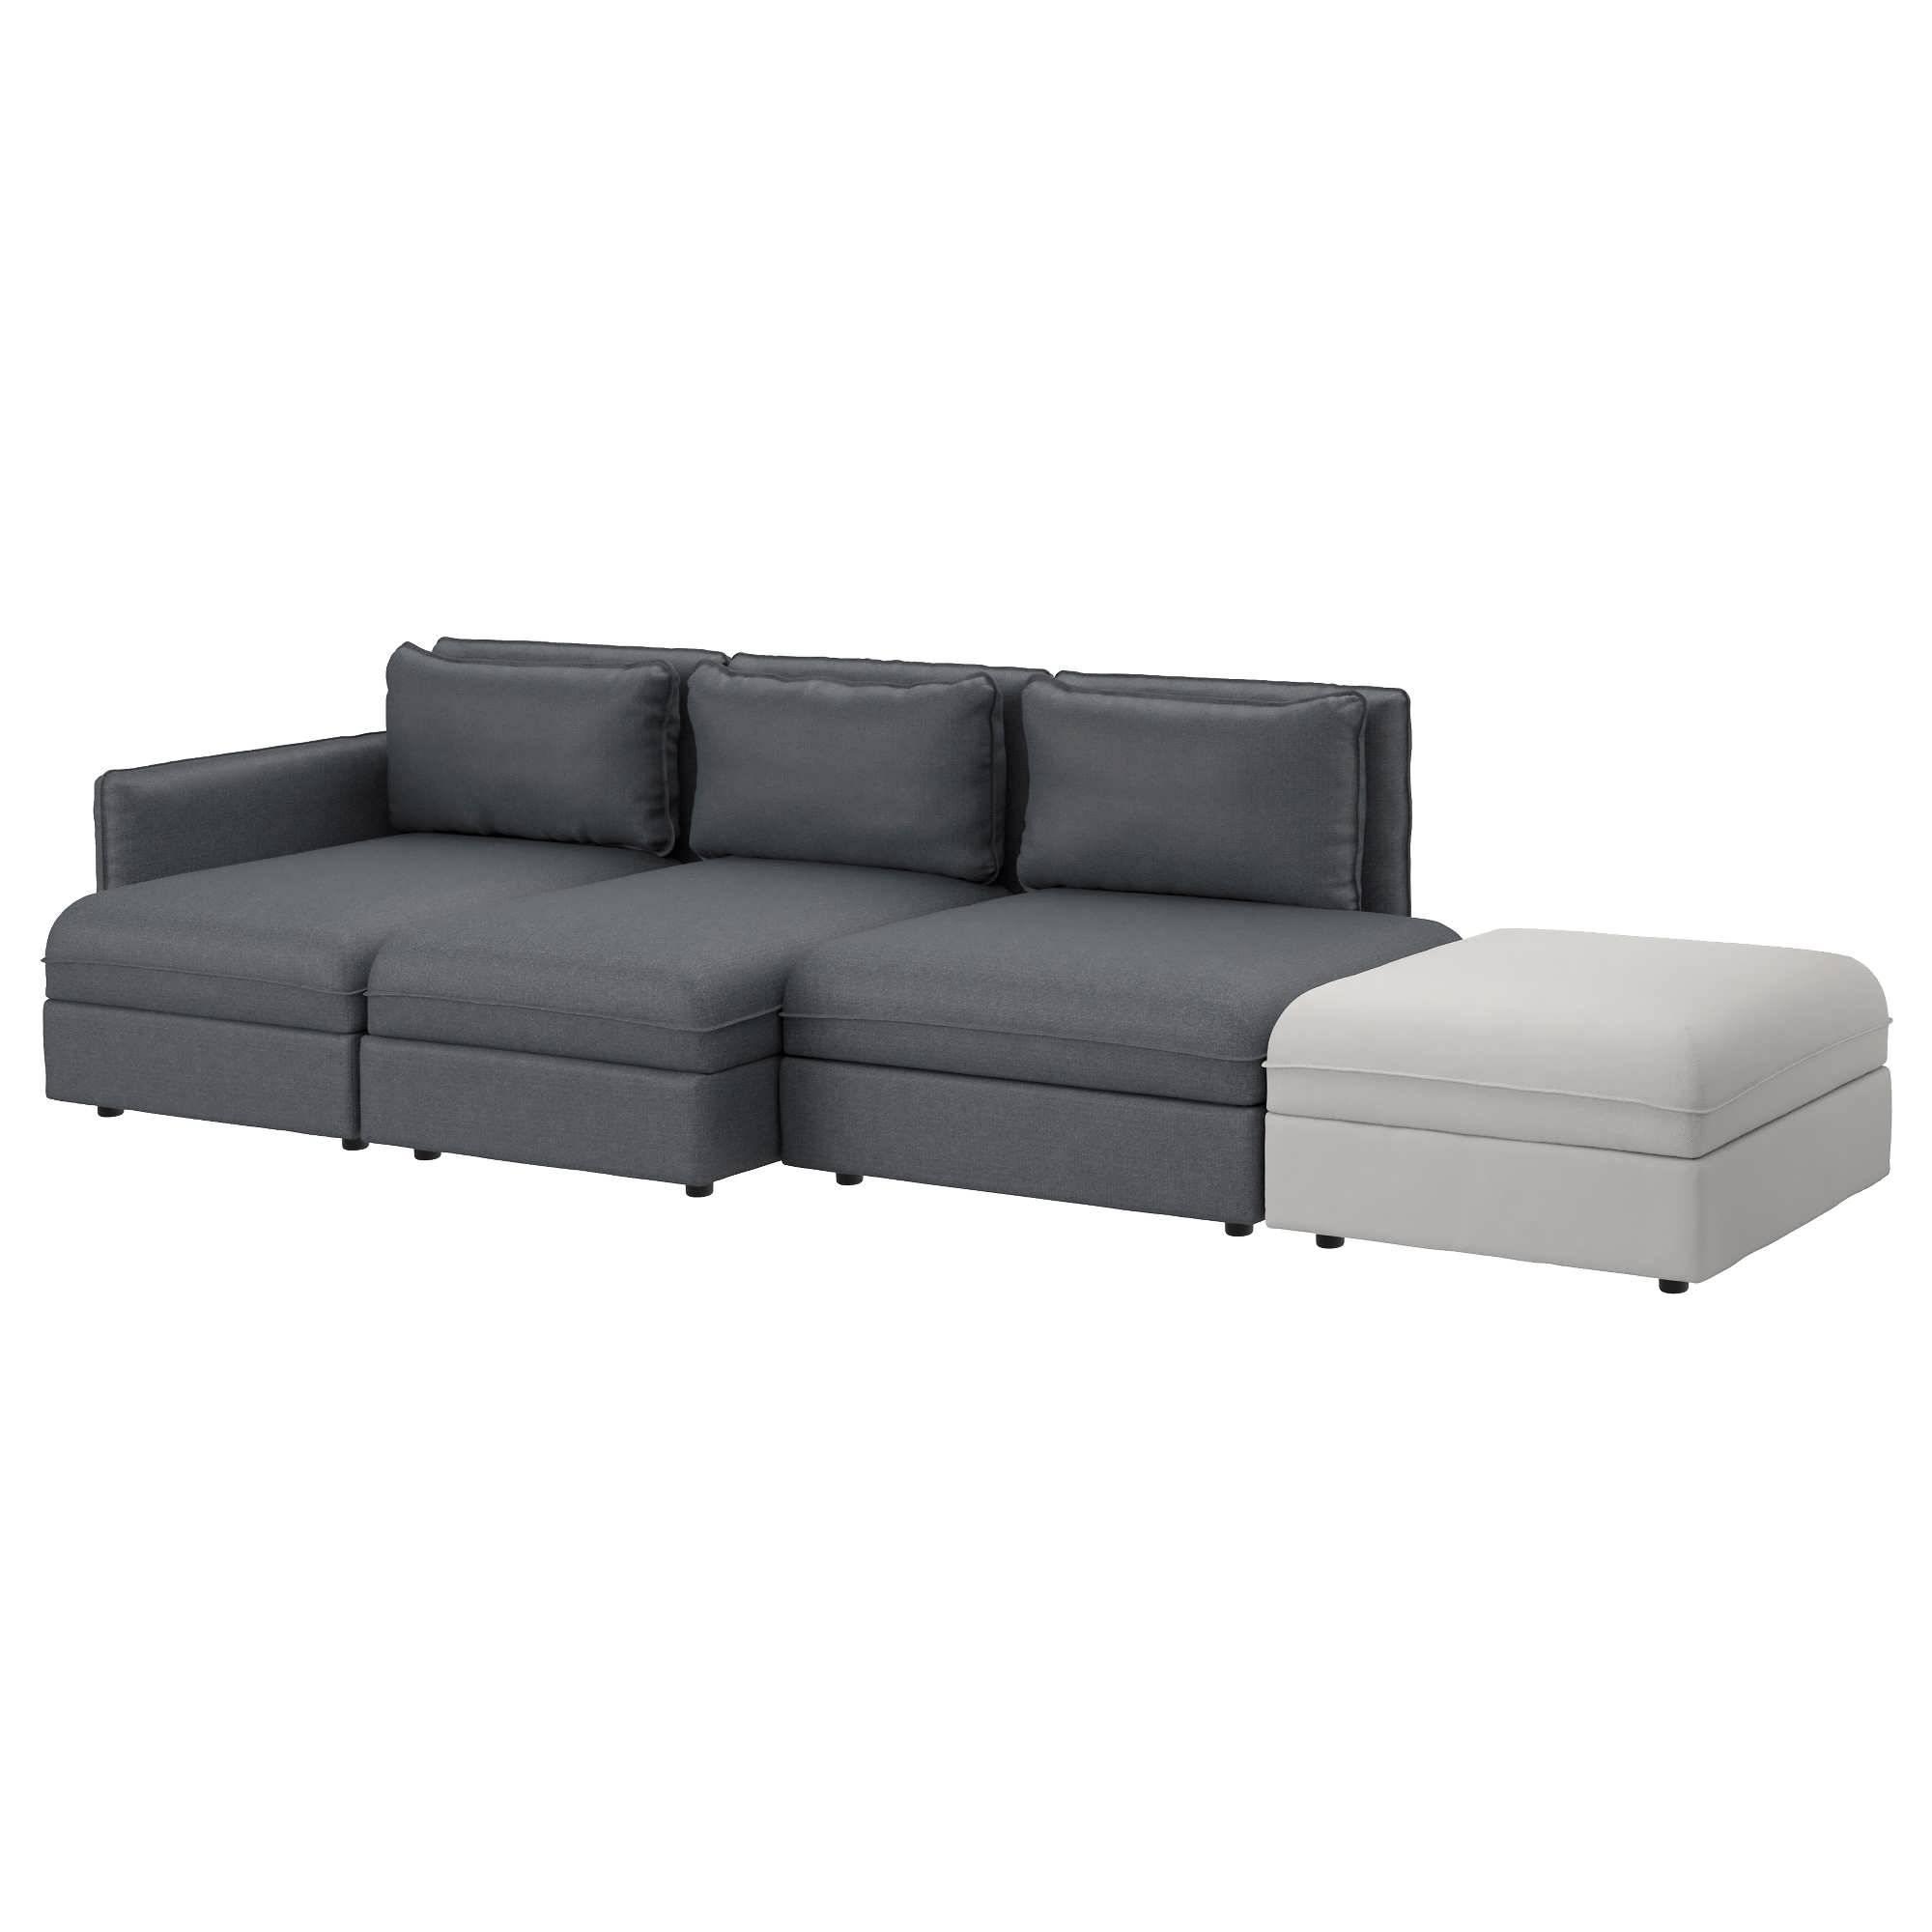 Sofa : Sleeper Sofa Ikea Sofa Modern Sofa Chenille Sofa Sofa Mart inside Chenille Sleeper Sofas (Image 12 of 15)